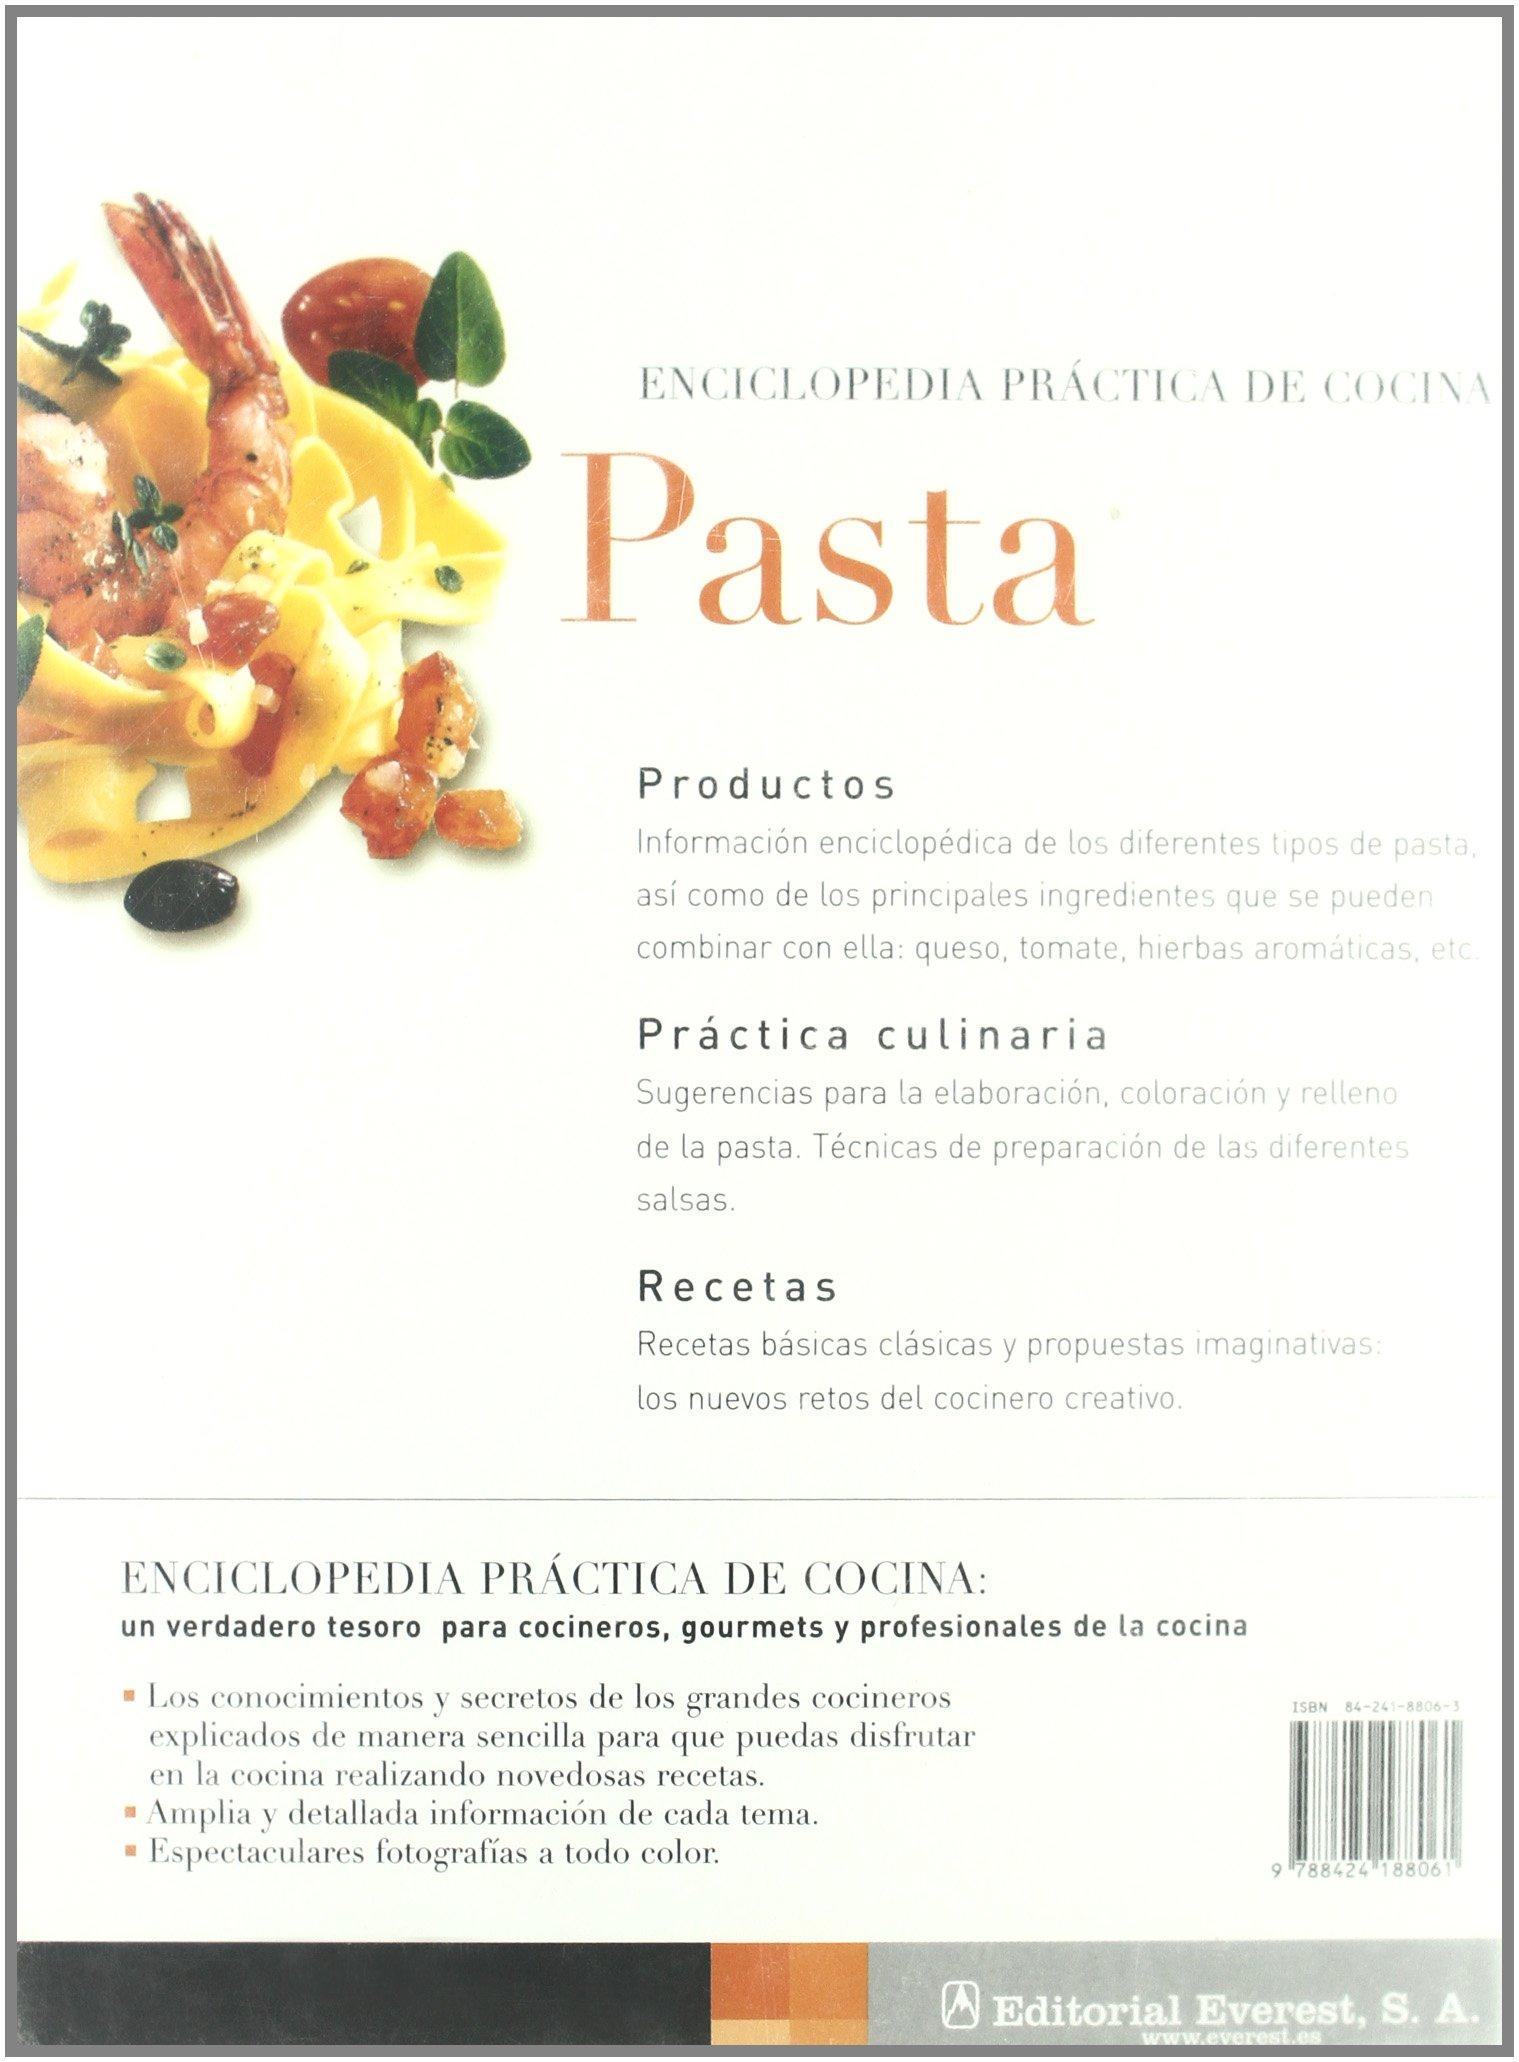 Pasta (Enciclopedia práctica de cocina): Amazon.es: Teubner Christian, Berasaín Villanueva Ambrosio: Libros